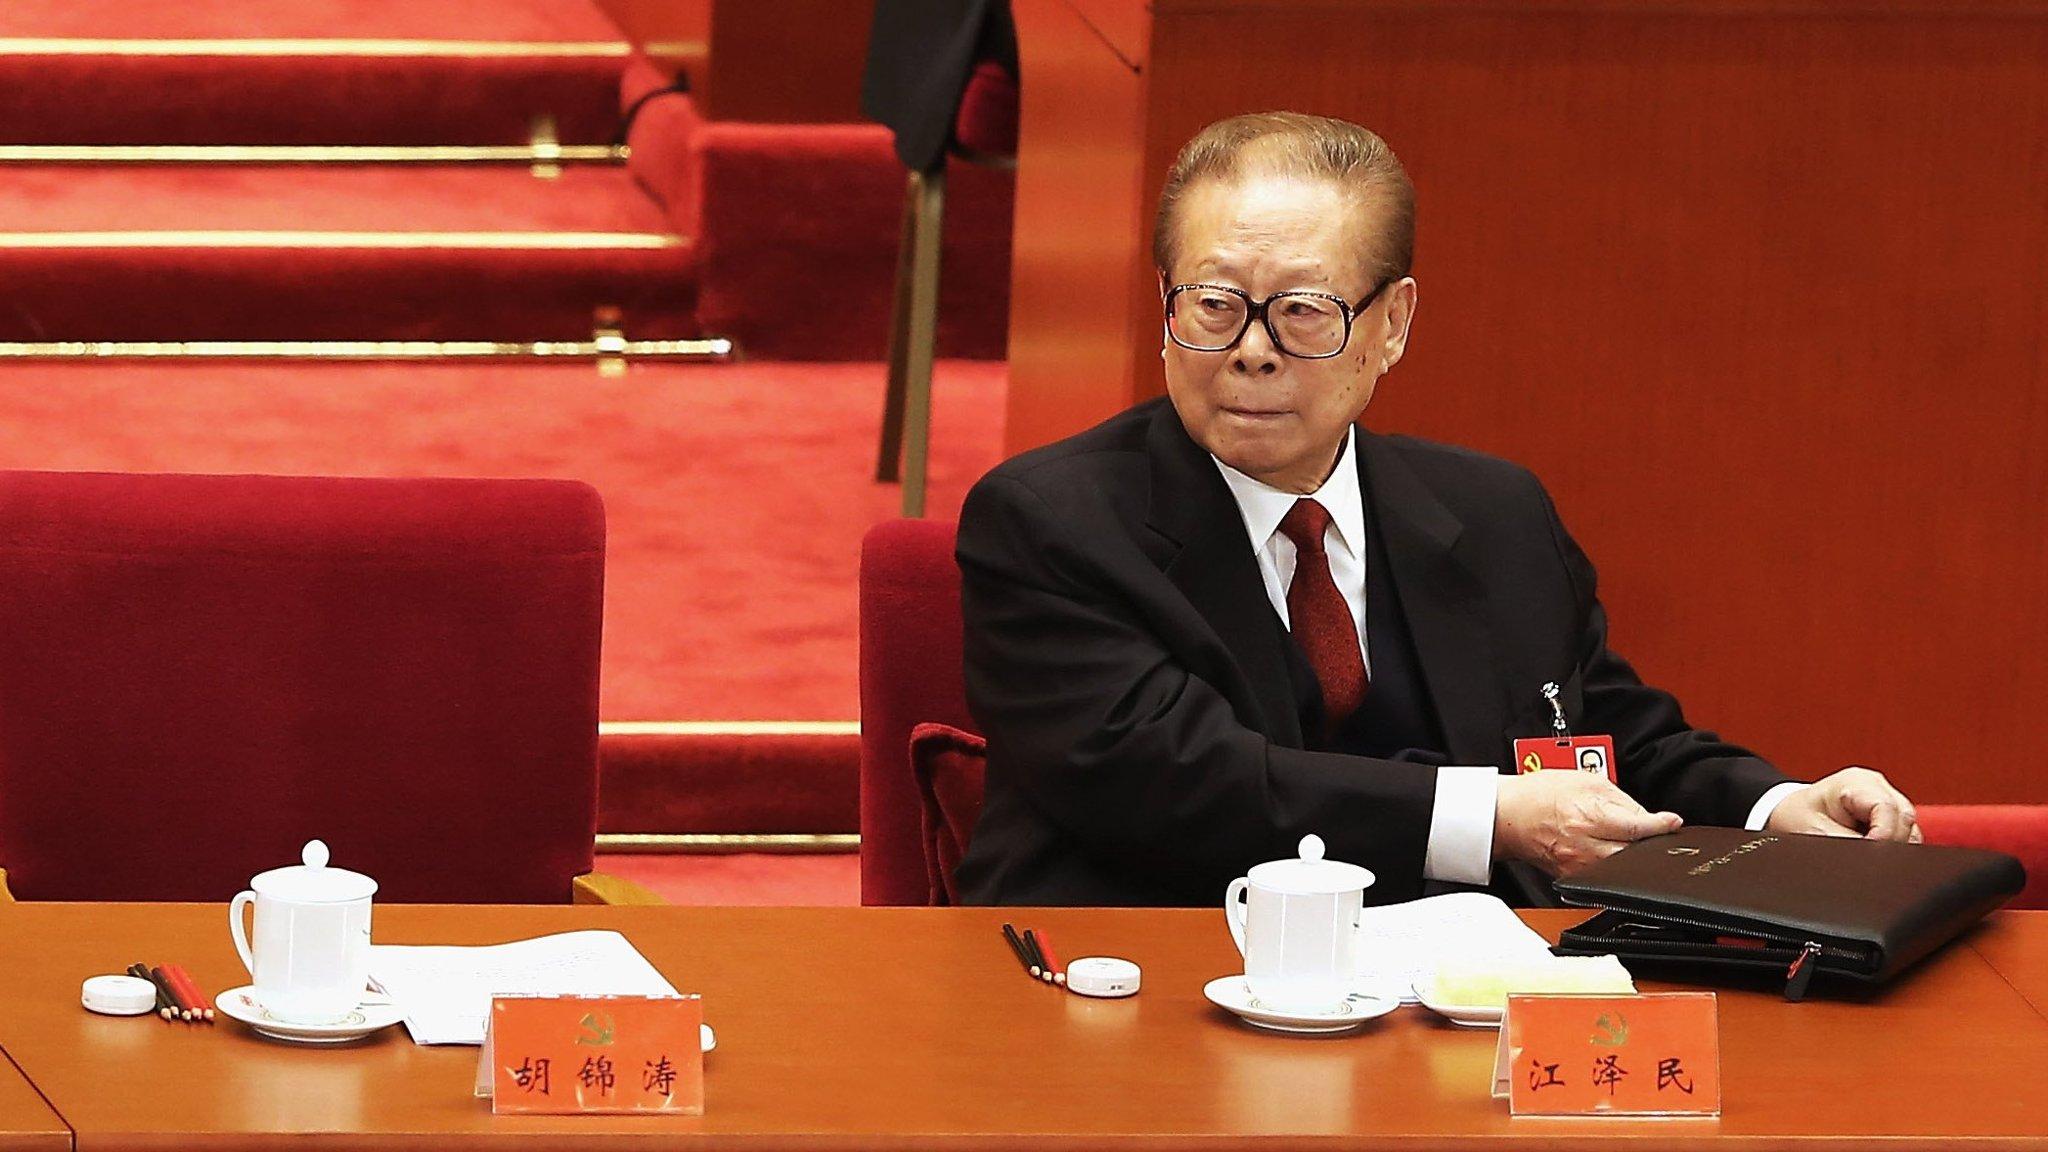 China cracks down on 'toadies' celebrating former president Jiang